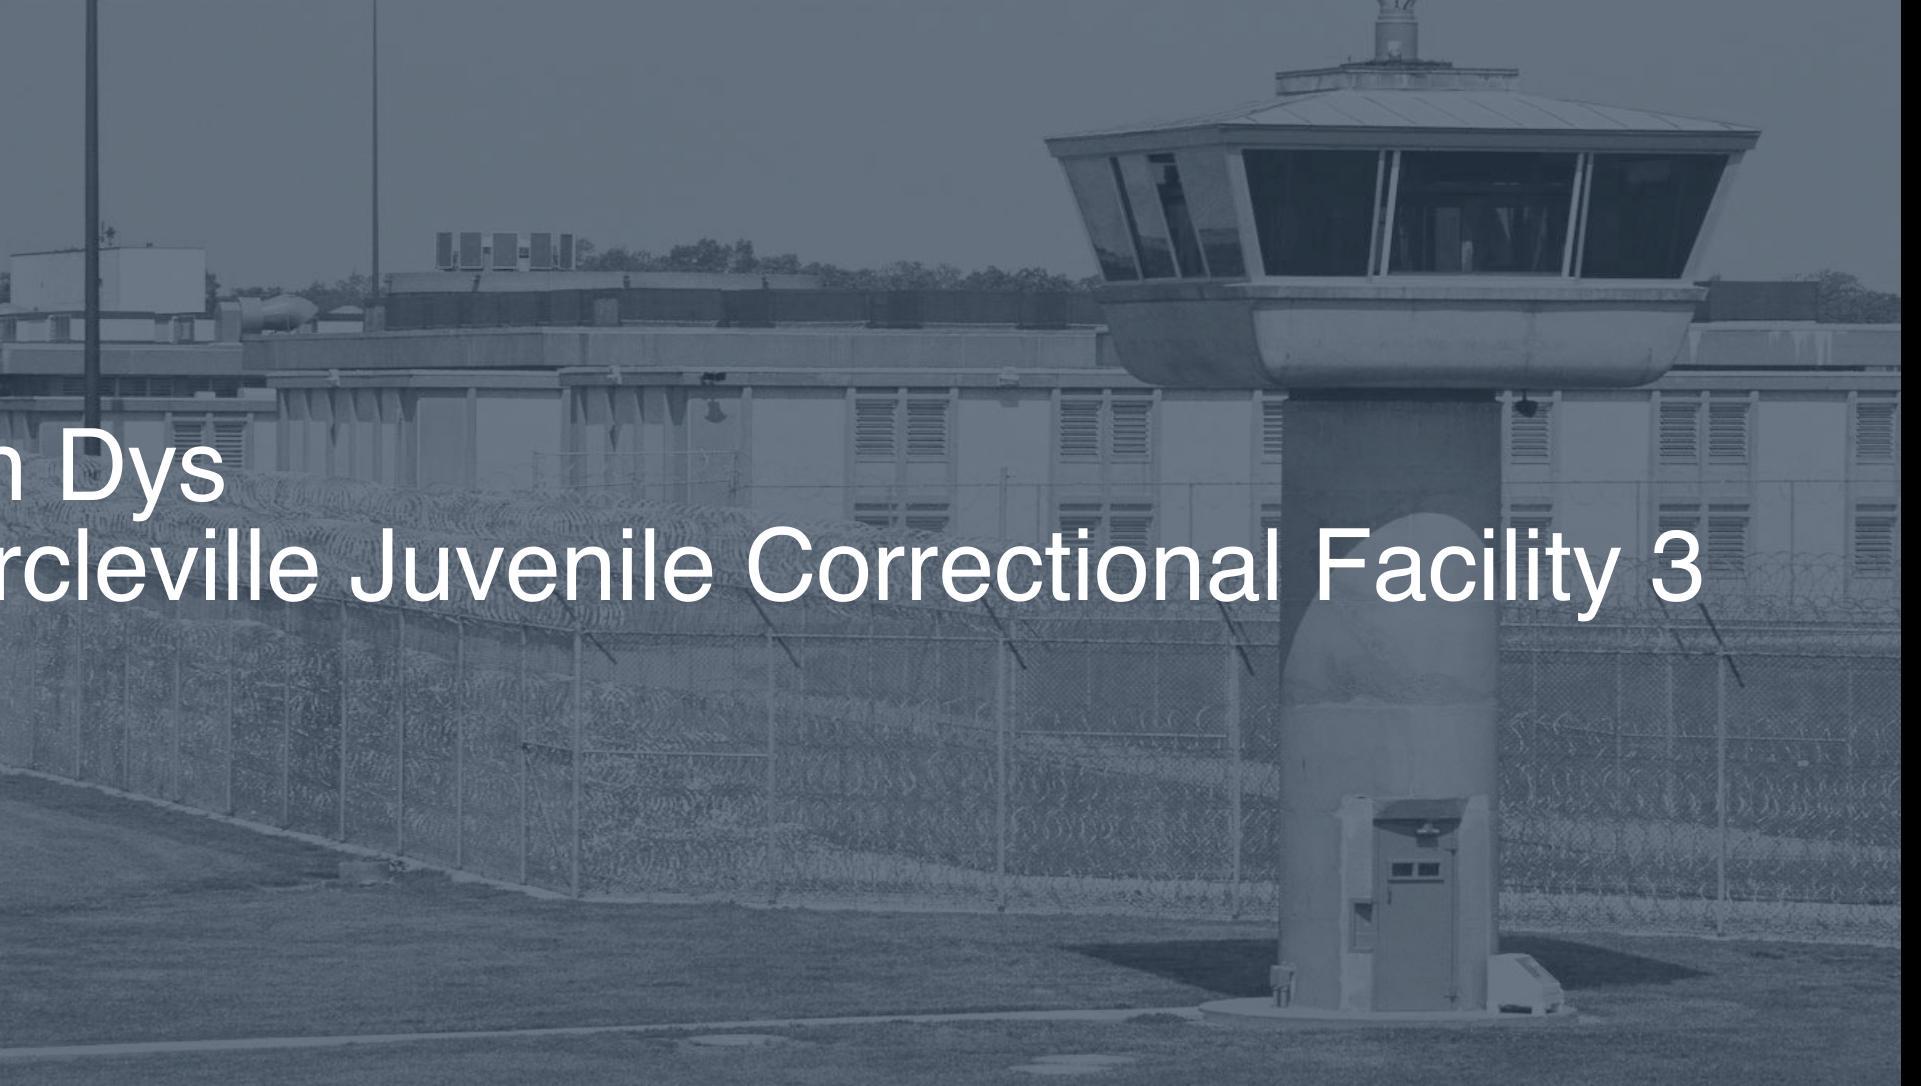 OH DYS - Circleville Juvenile Correctional Facility correctional facility picture